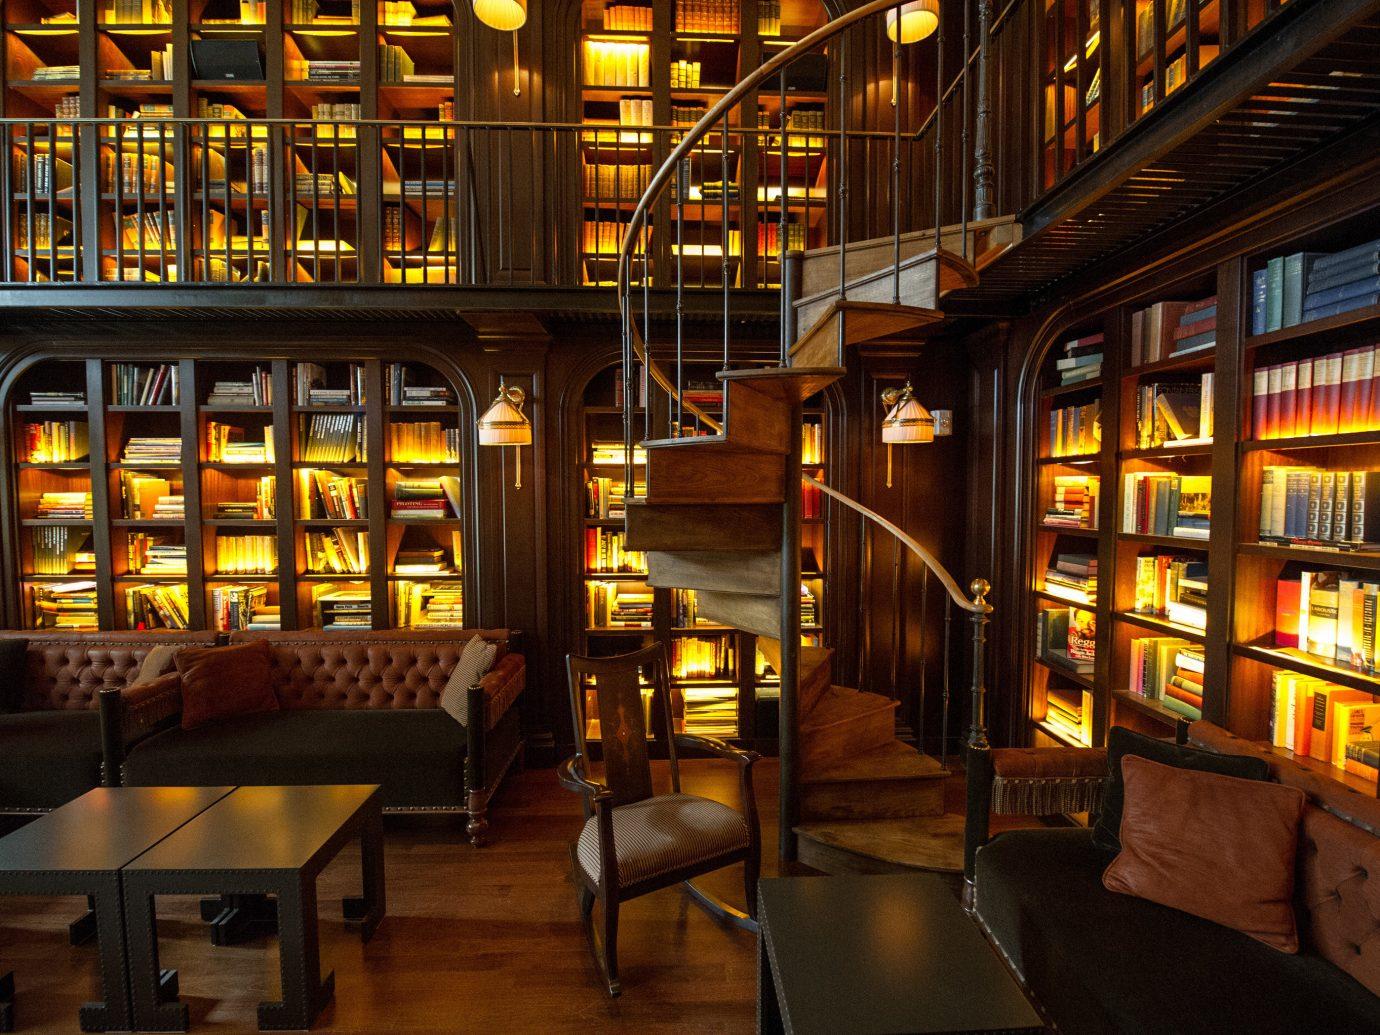 Offbeat library indoor building lighting interior design Design restaurant Bar bookselling room